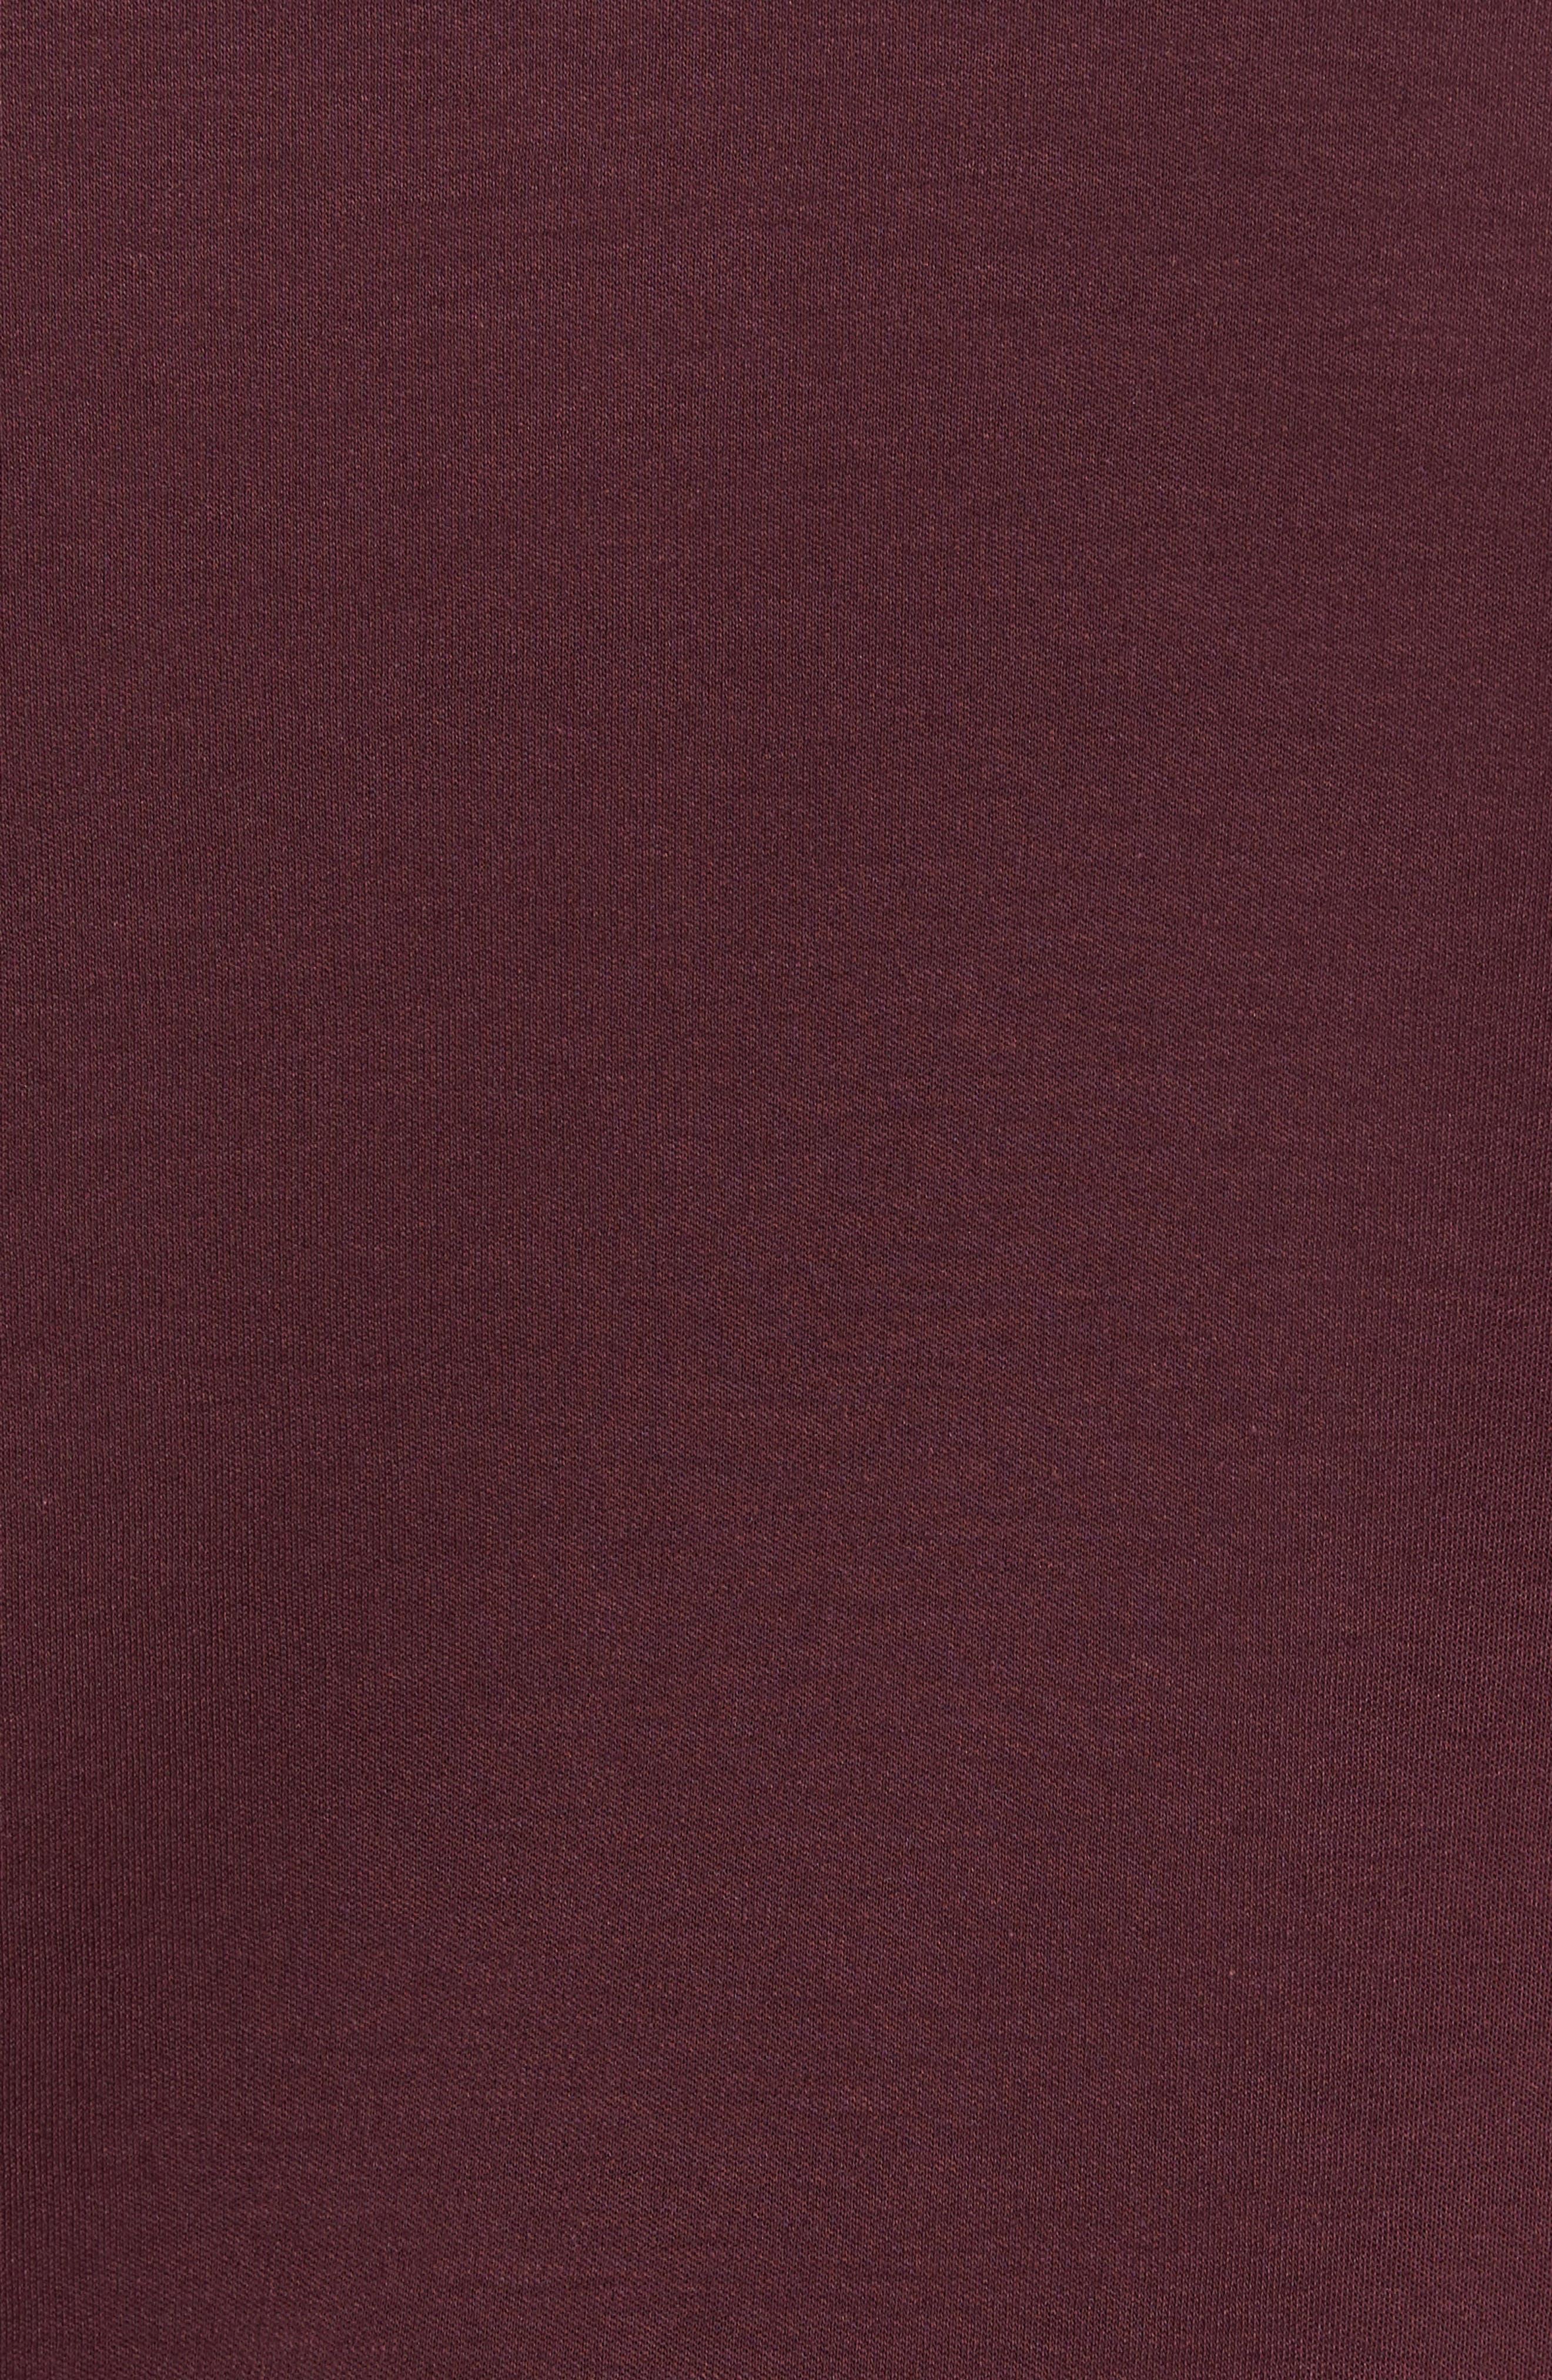 Grindstone Slim Fit Polo,                             Alternate thumbnail 5, color,                             Burgundy